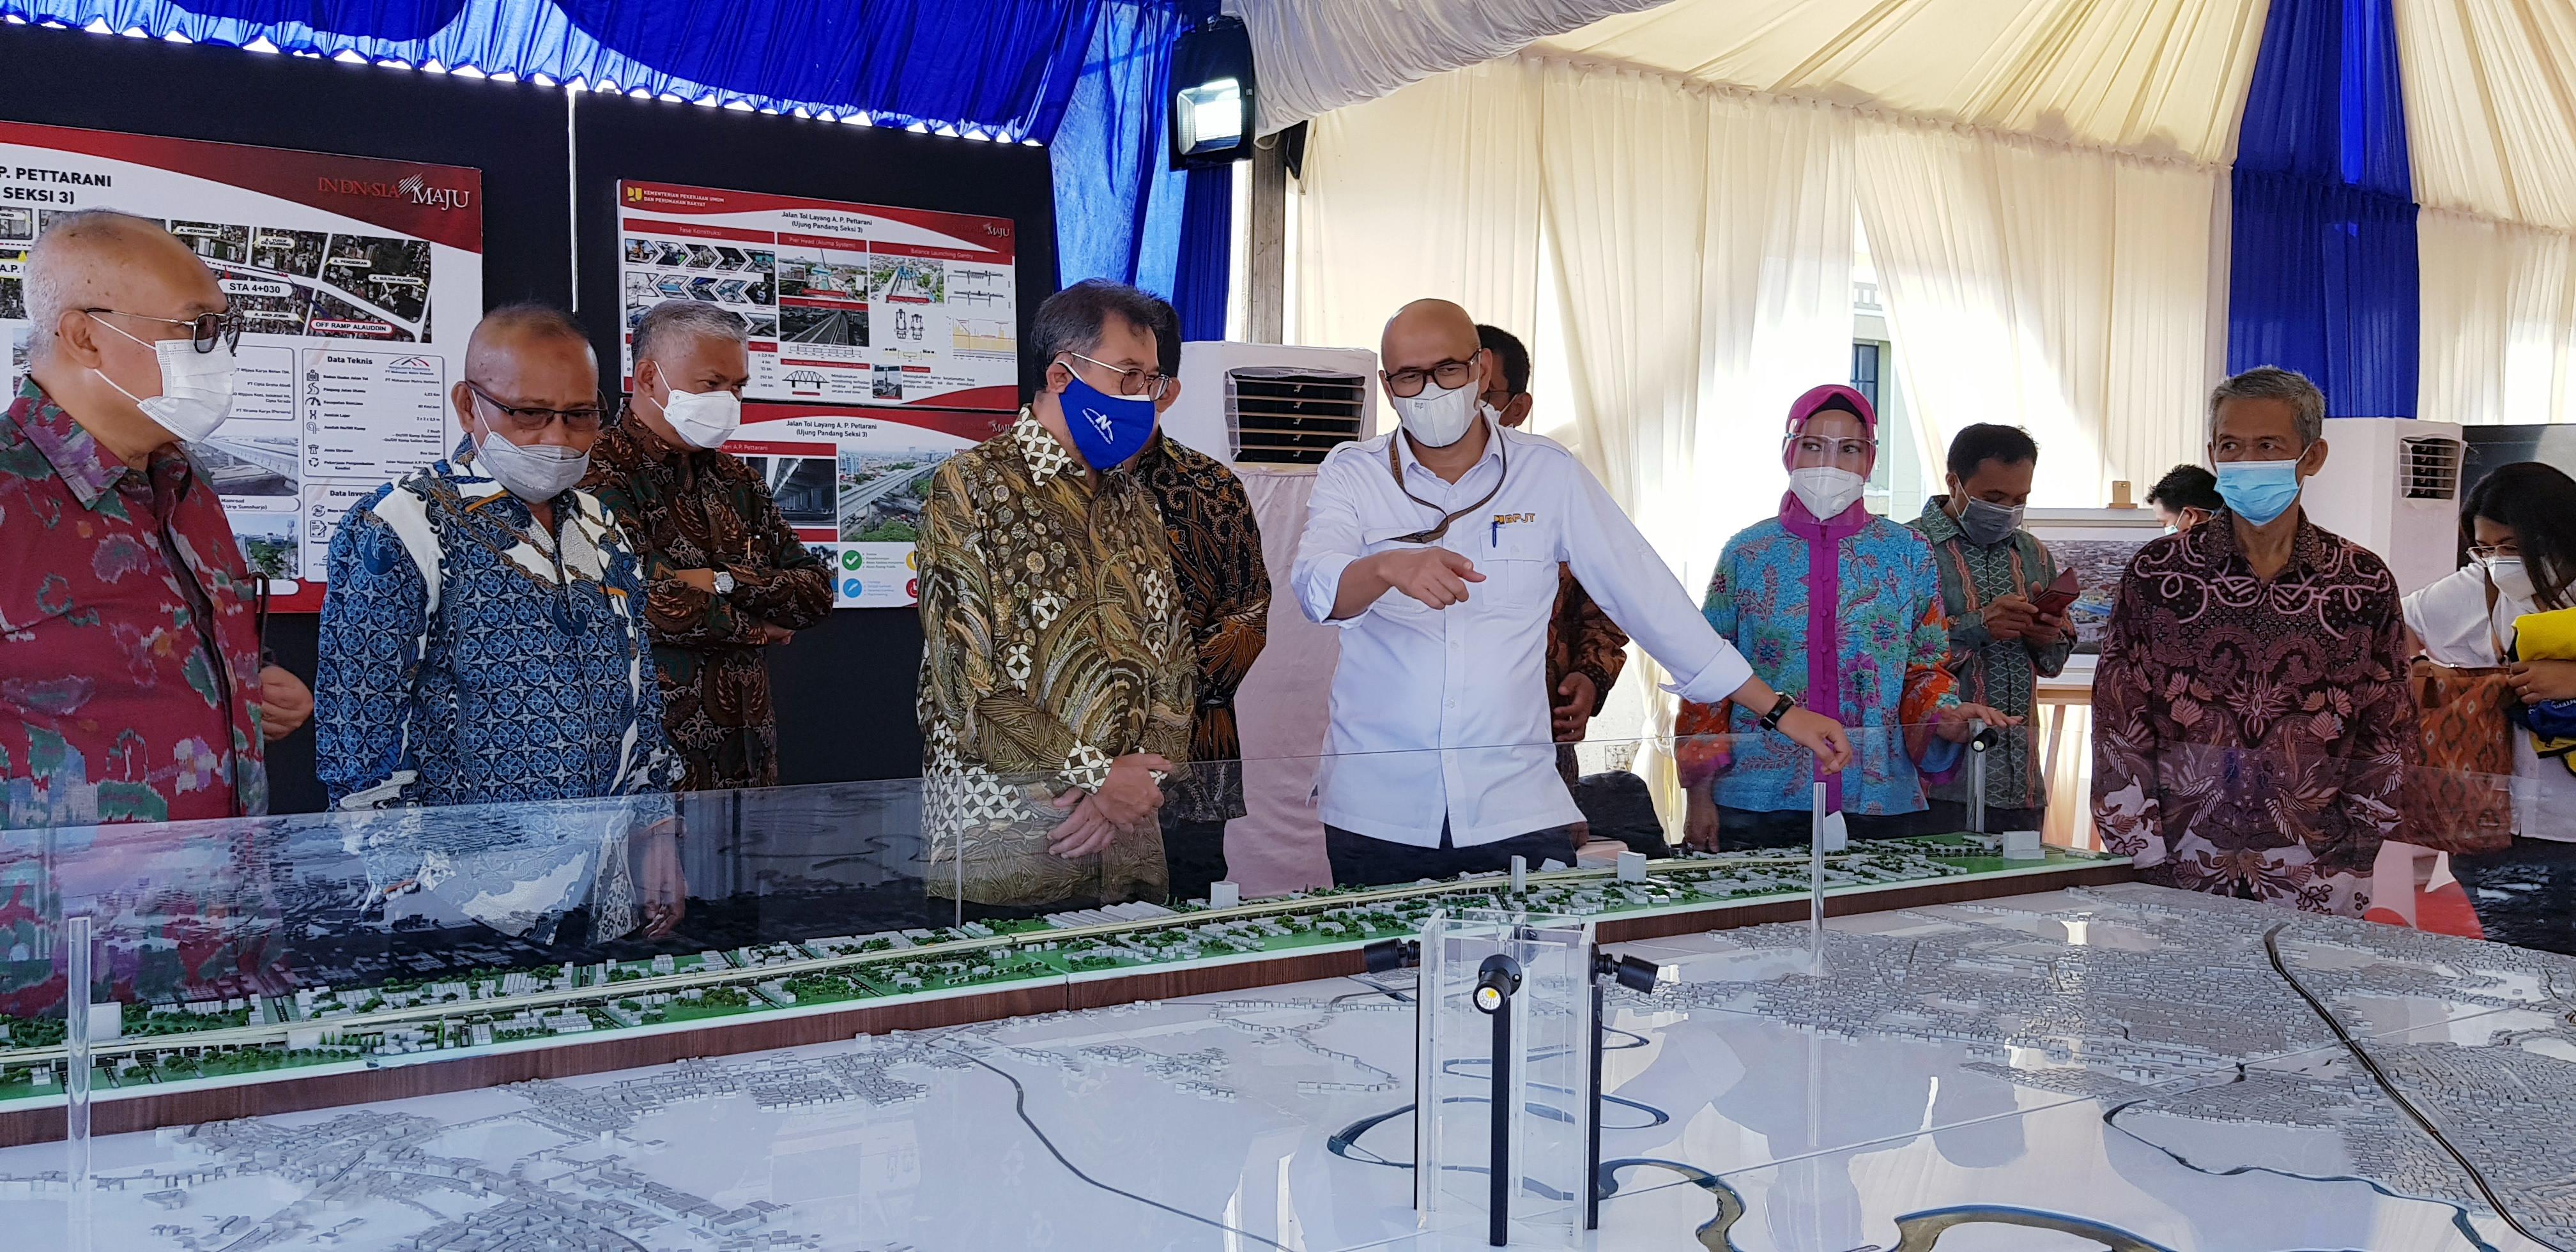 Peresmian Tol Layang A.P. Pettarani Makassar